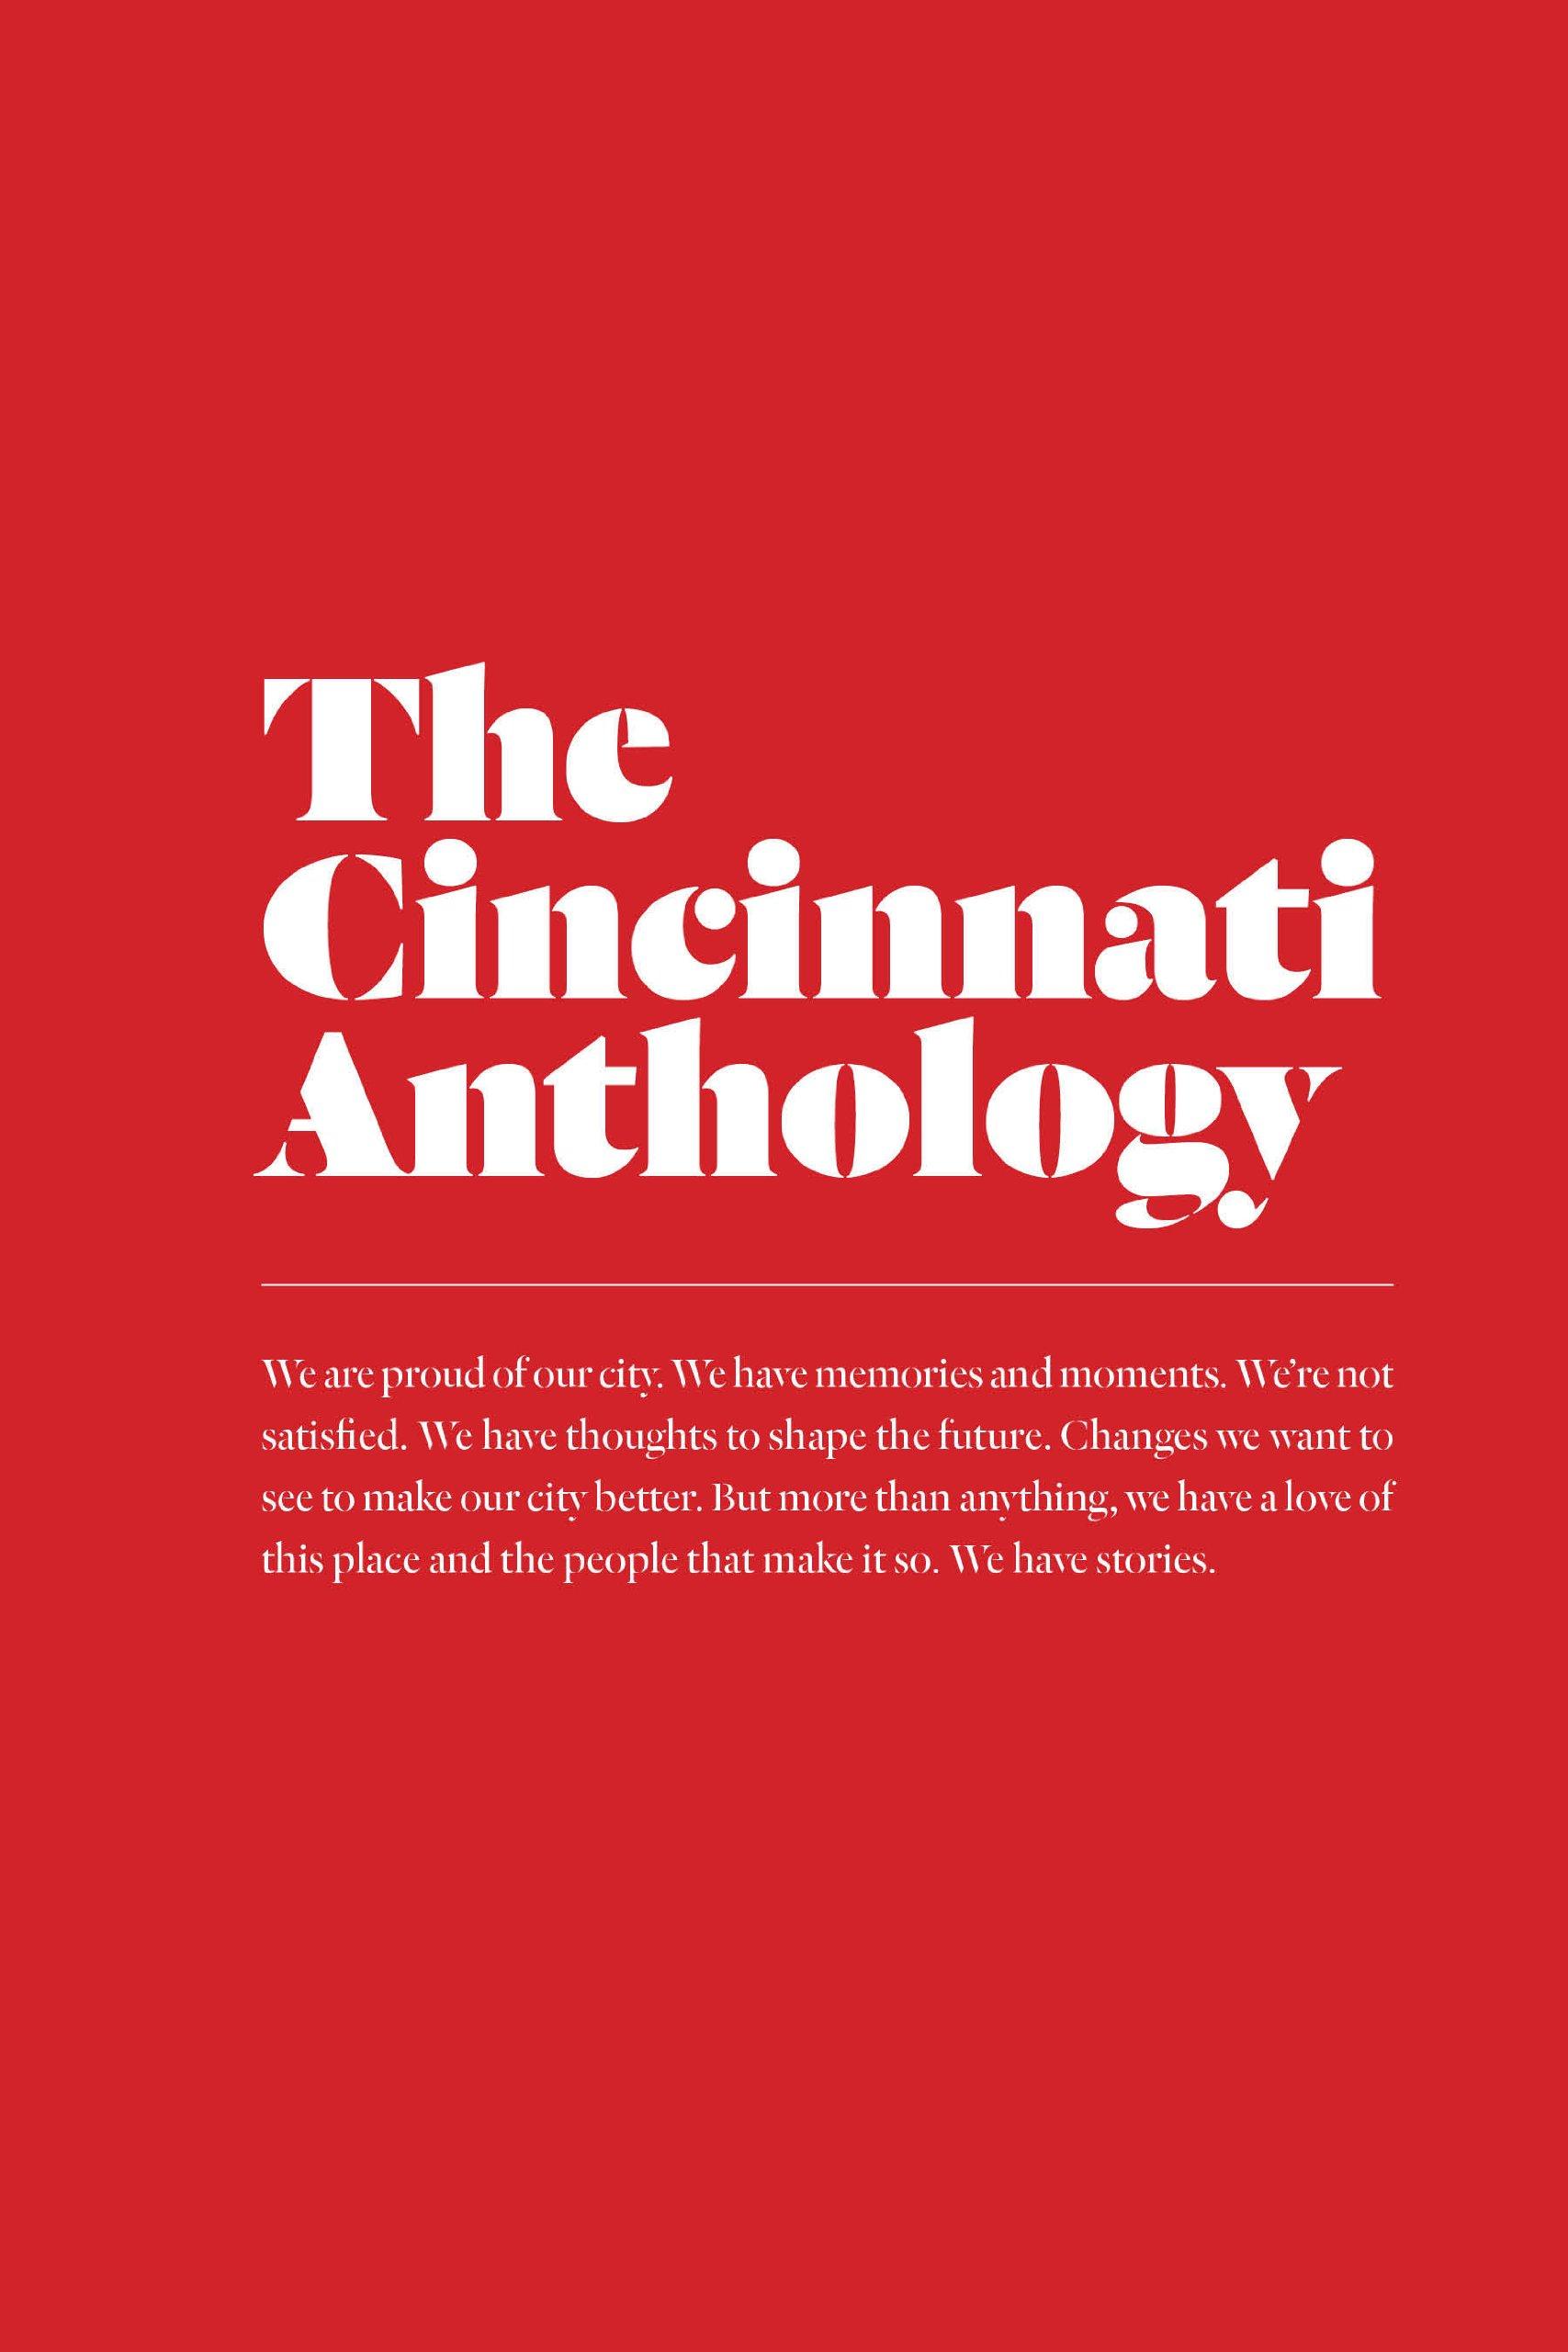 Cincinnati Anthology.jpg